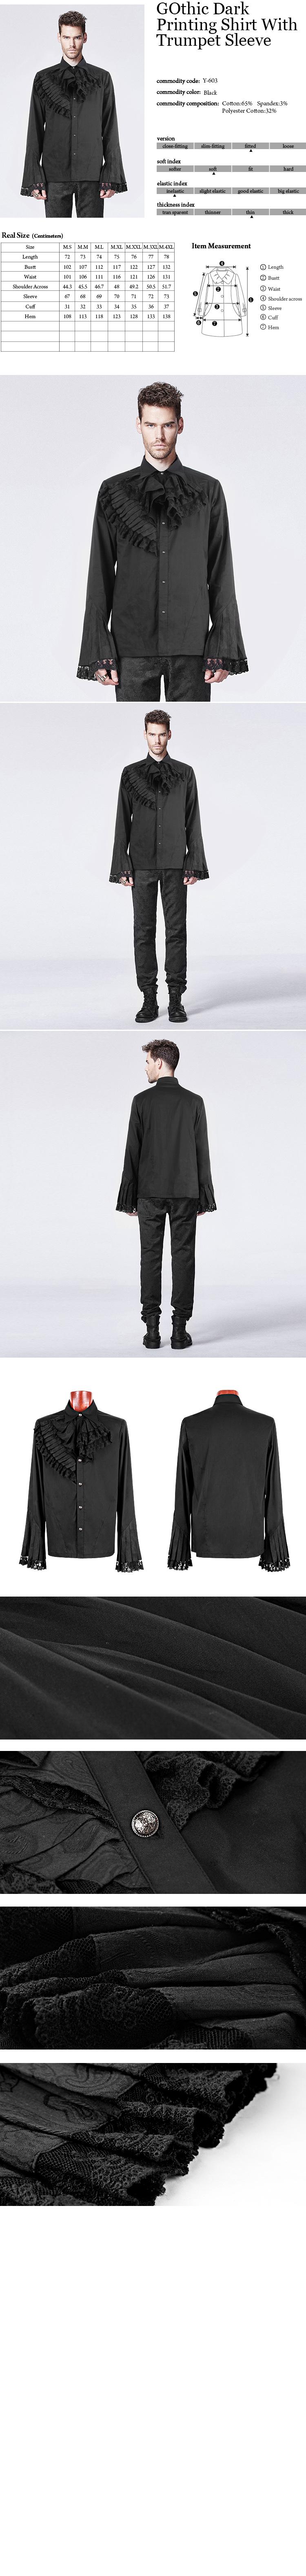 Goth aristocrat imperial Louis gilded crest lantern sleeve dress shirt【SHT02301】